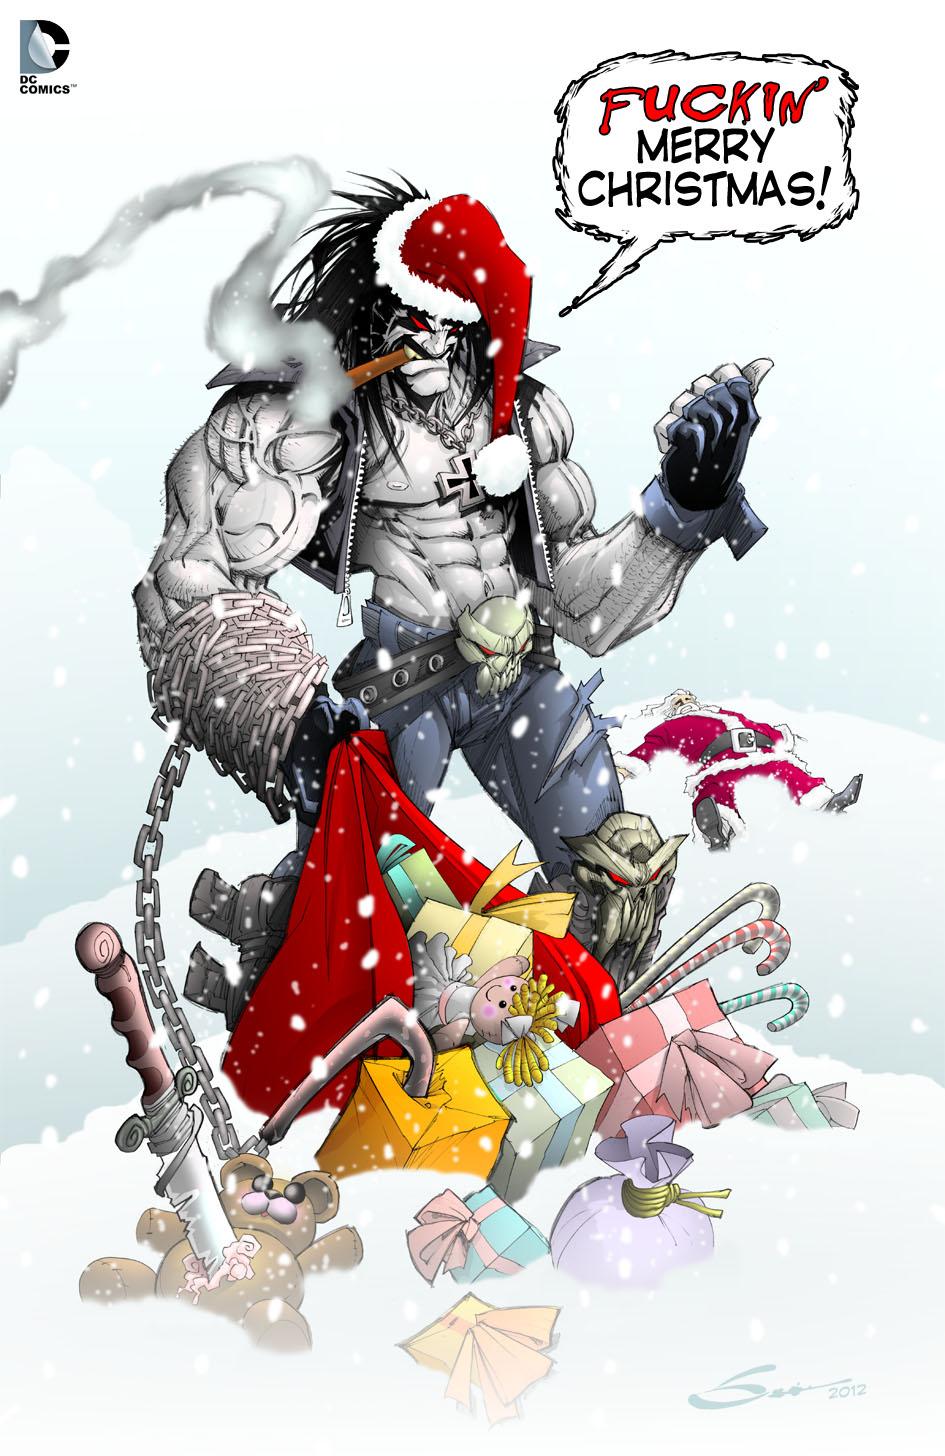 LOBO CHRISTMAS! by Sandoval-Art